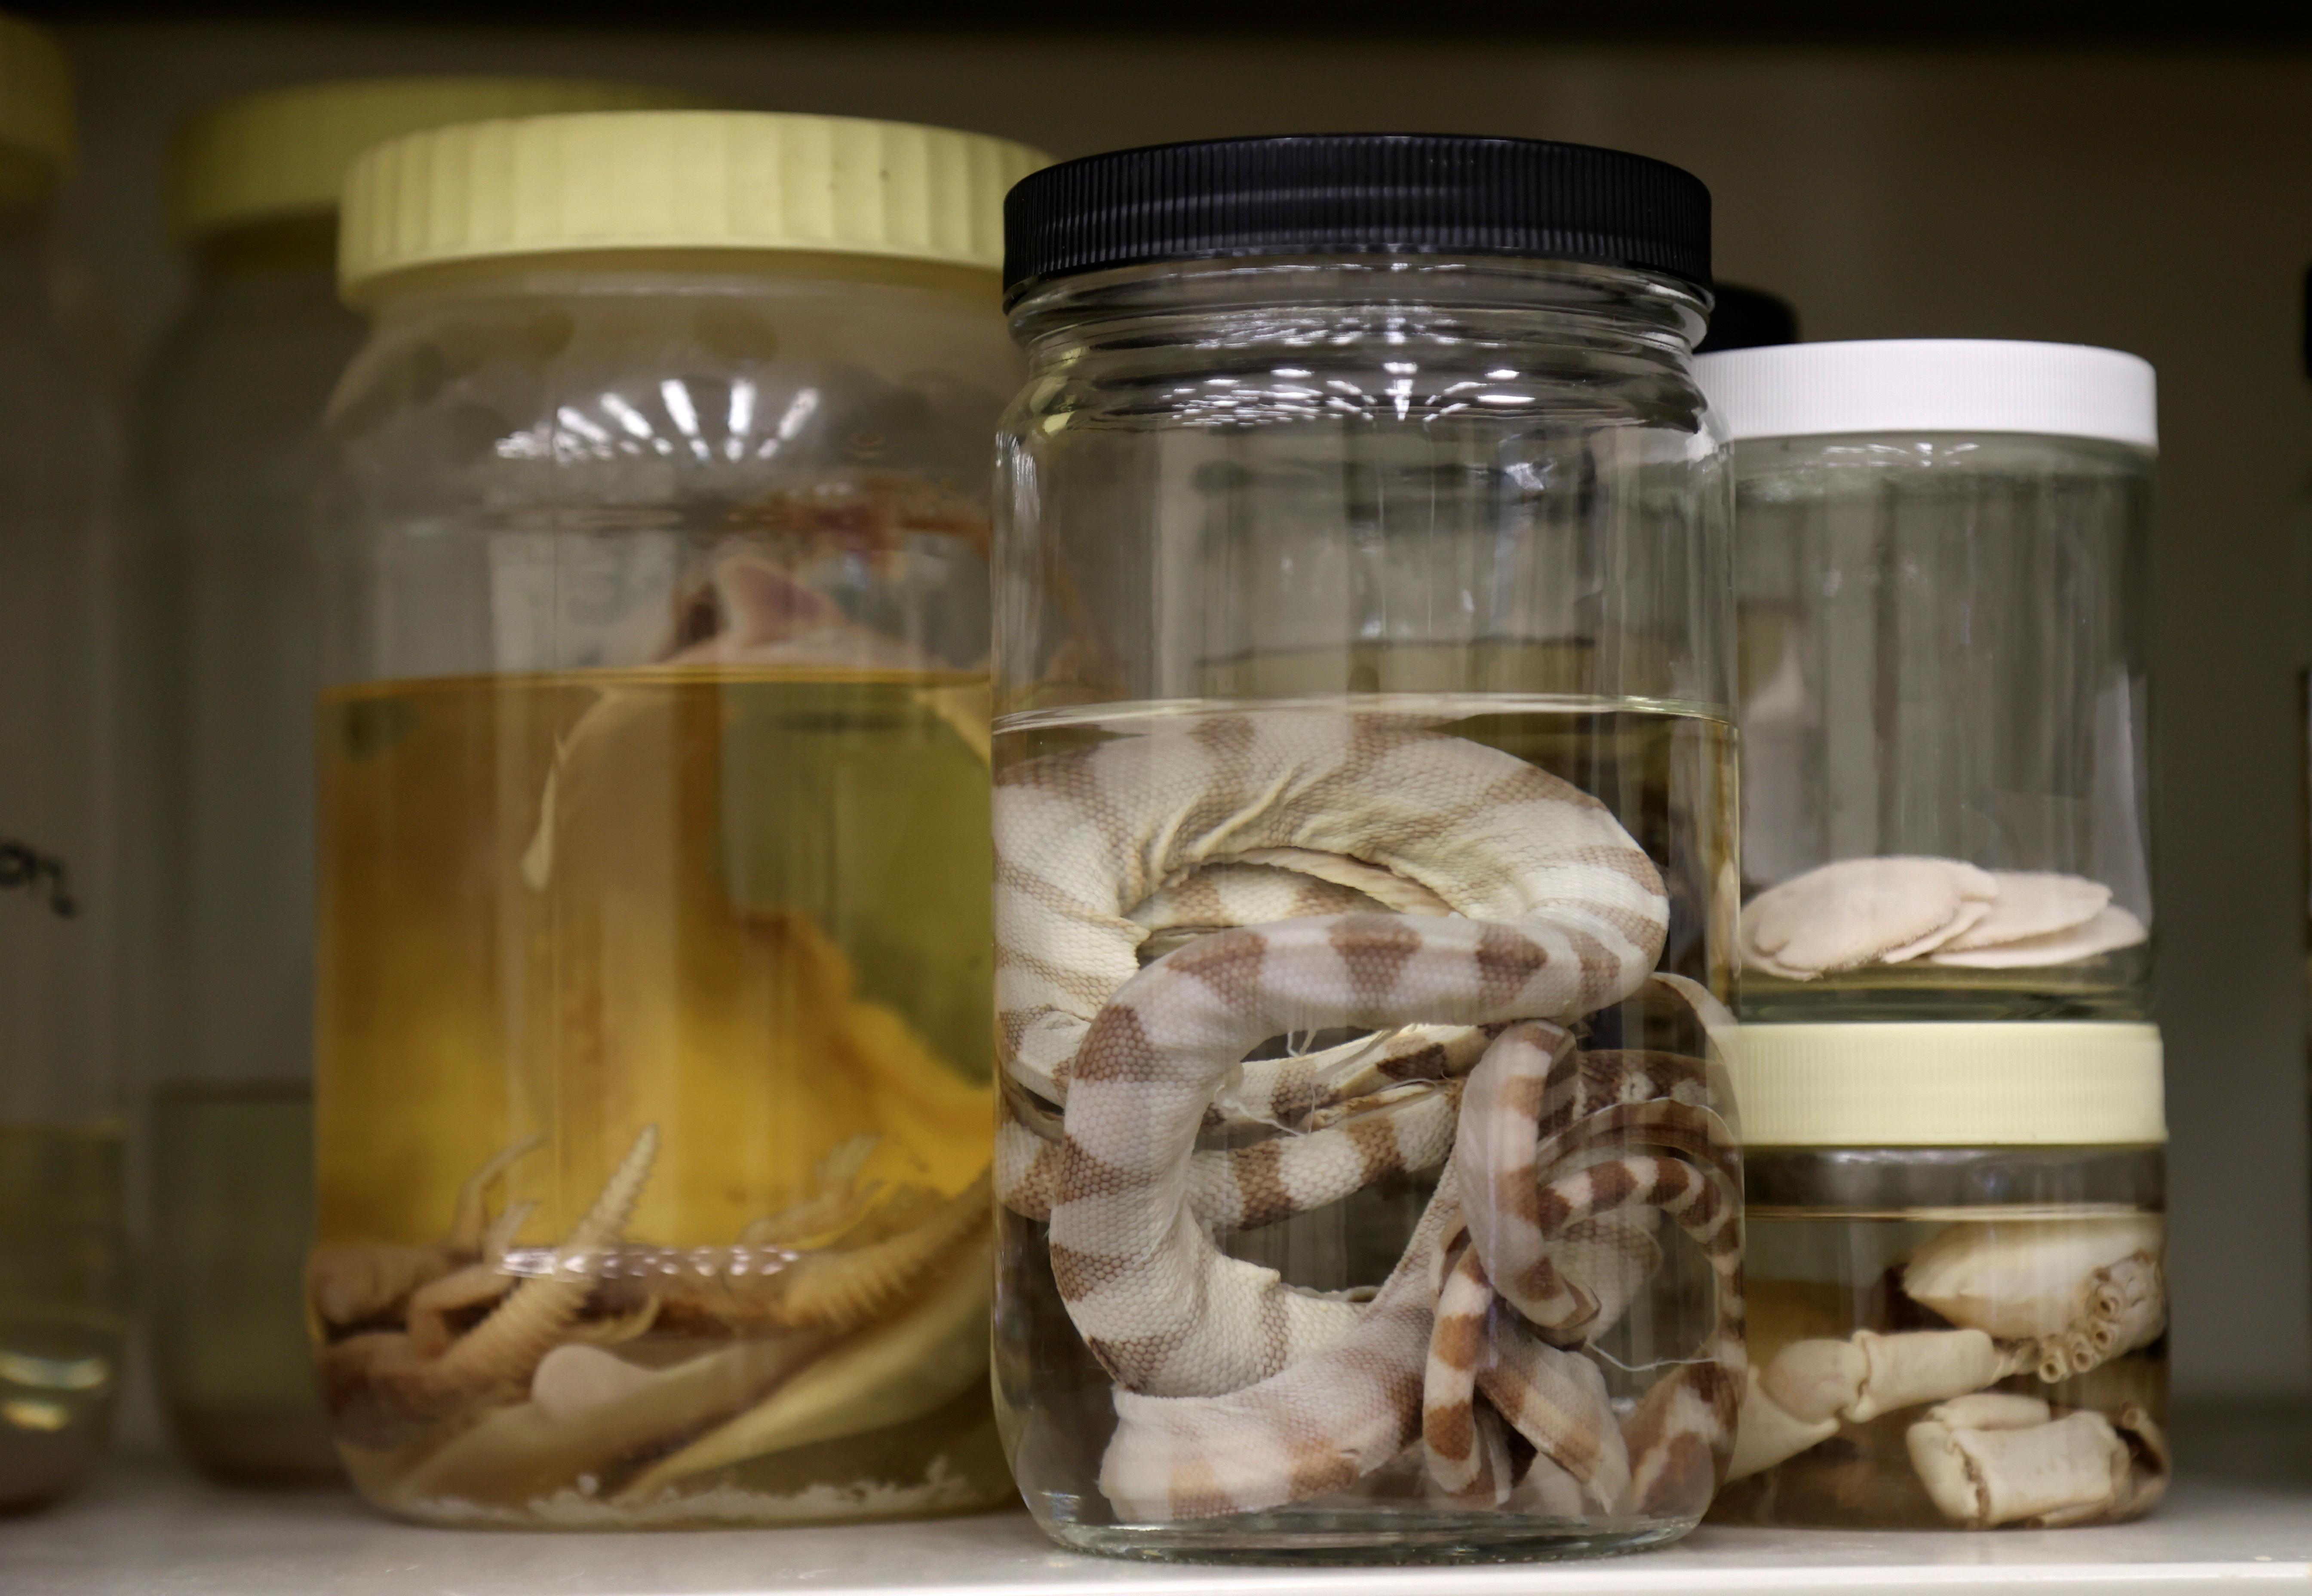 Samples of marine species are displayed at Qatar University Marine Biology Laboratory in Doha, Qatar February 14, 2021. Picture taken February 14, 2021. REUTERS/Ibraheem Al Omari